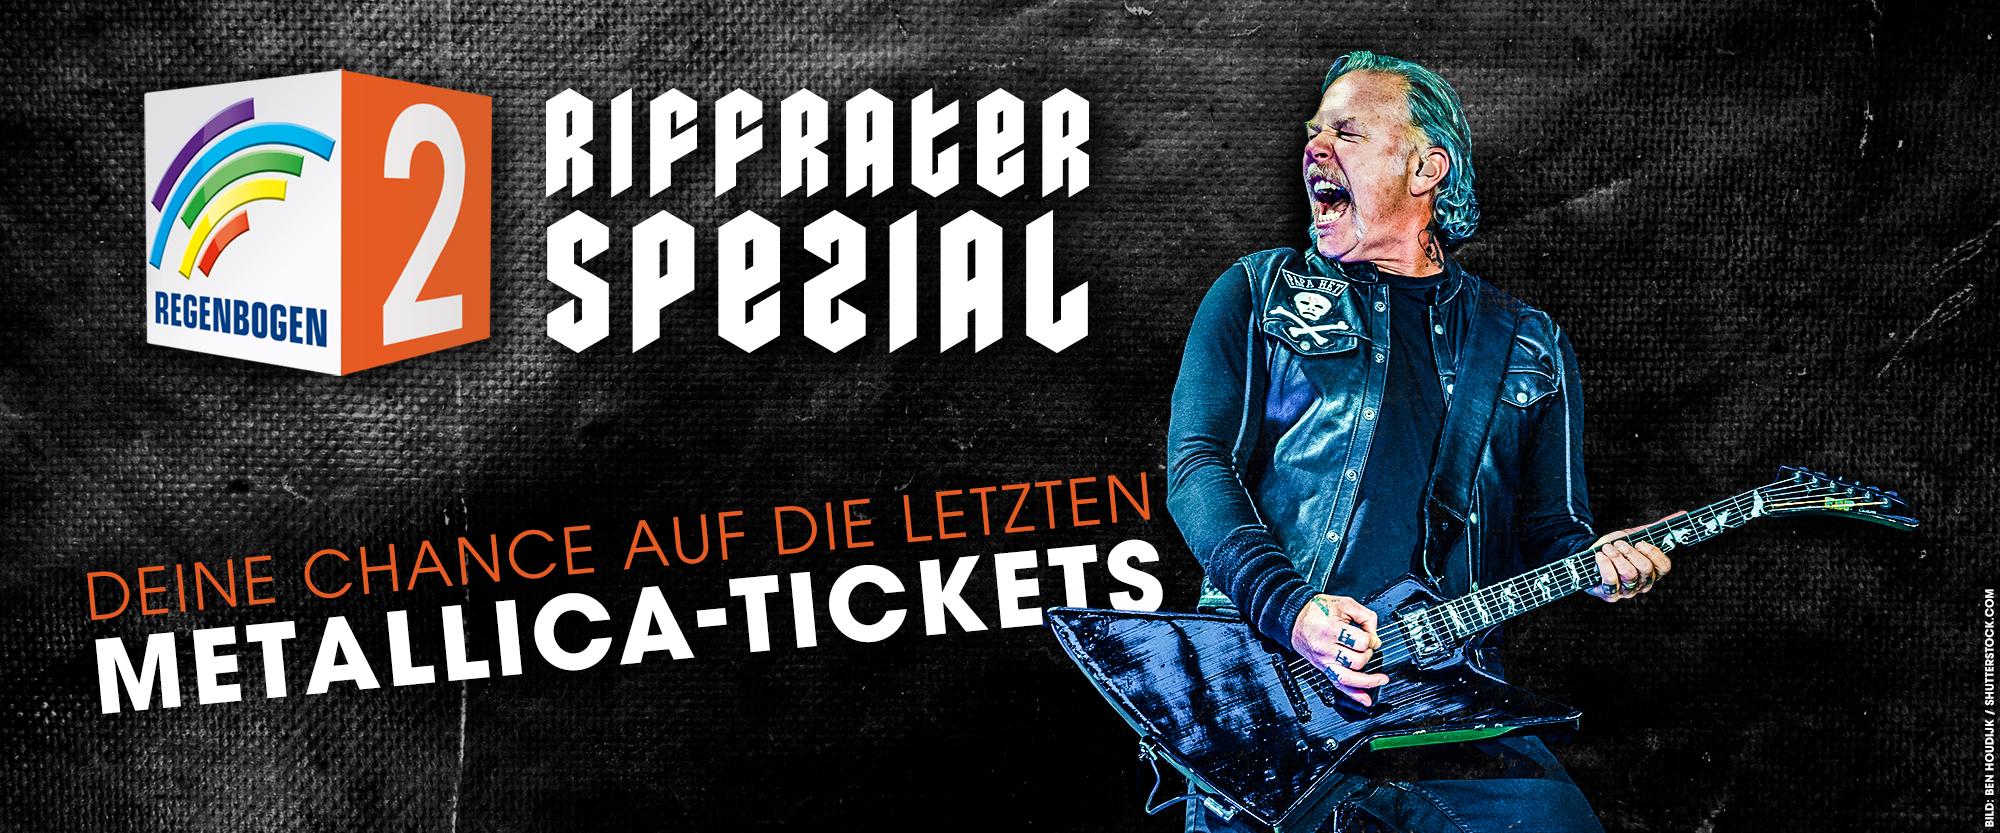 Riffrater-Metallica-Titel.jpg